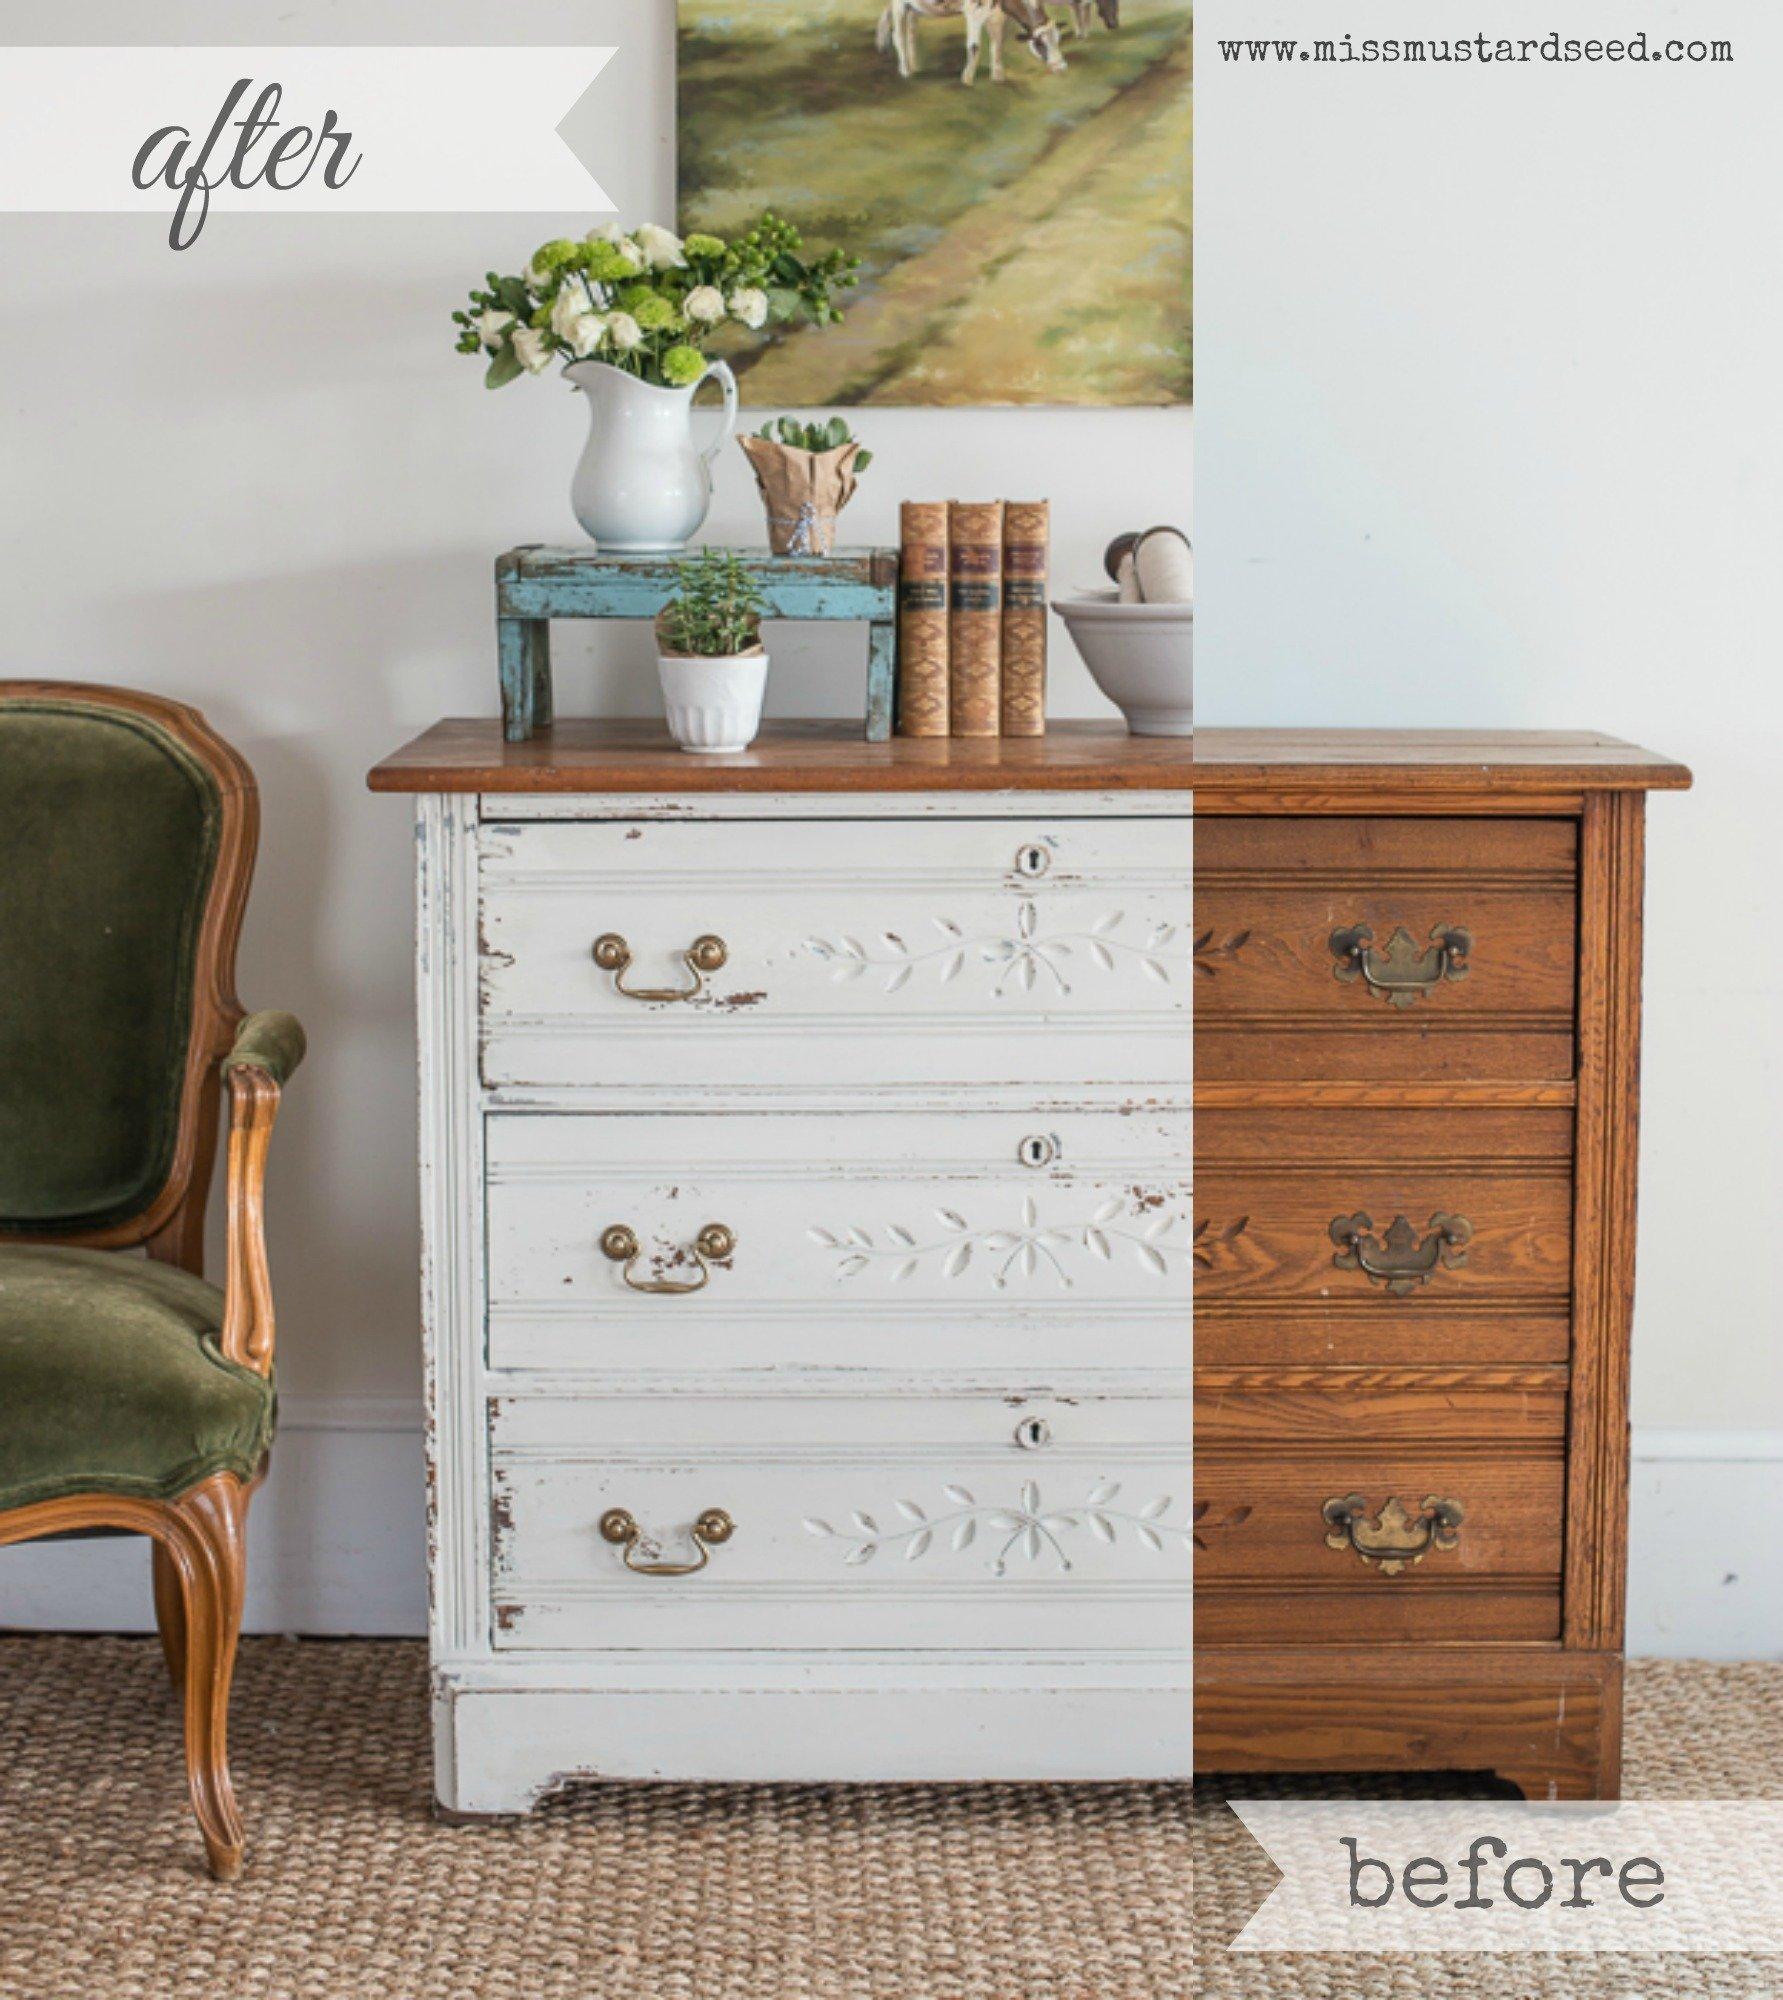 Dresser Before & After Collage